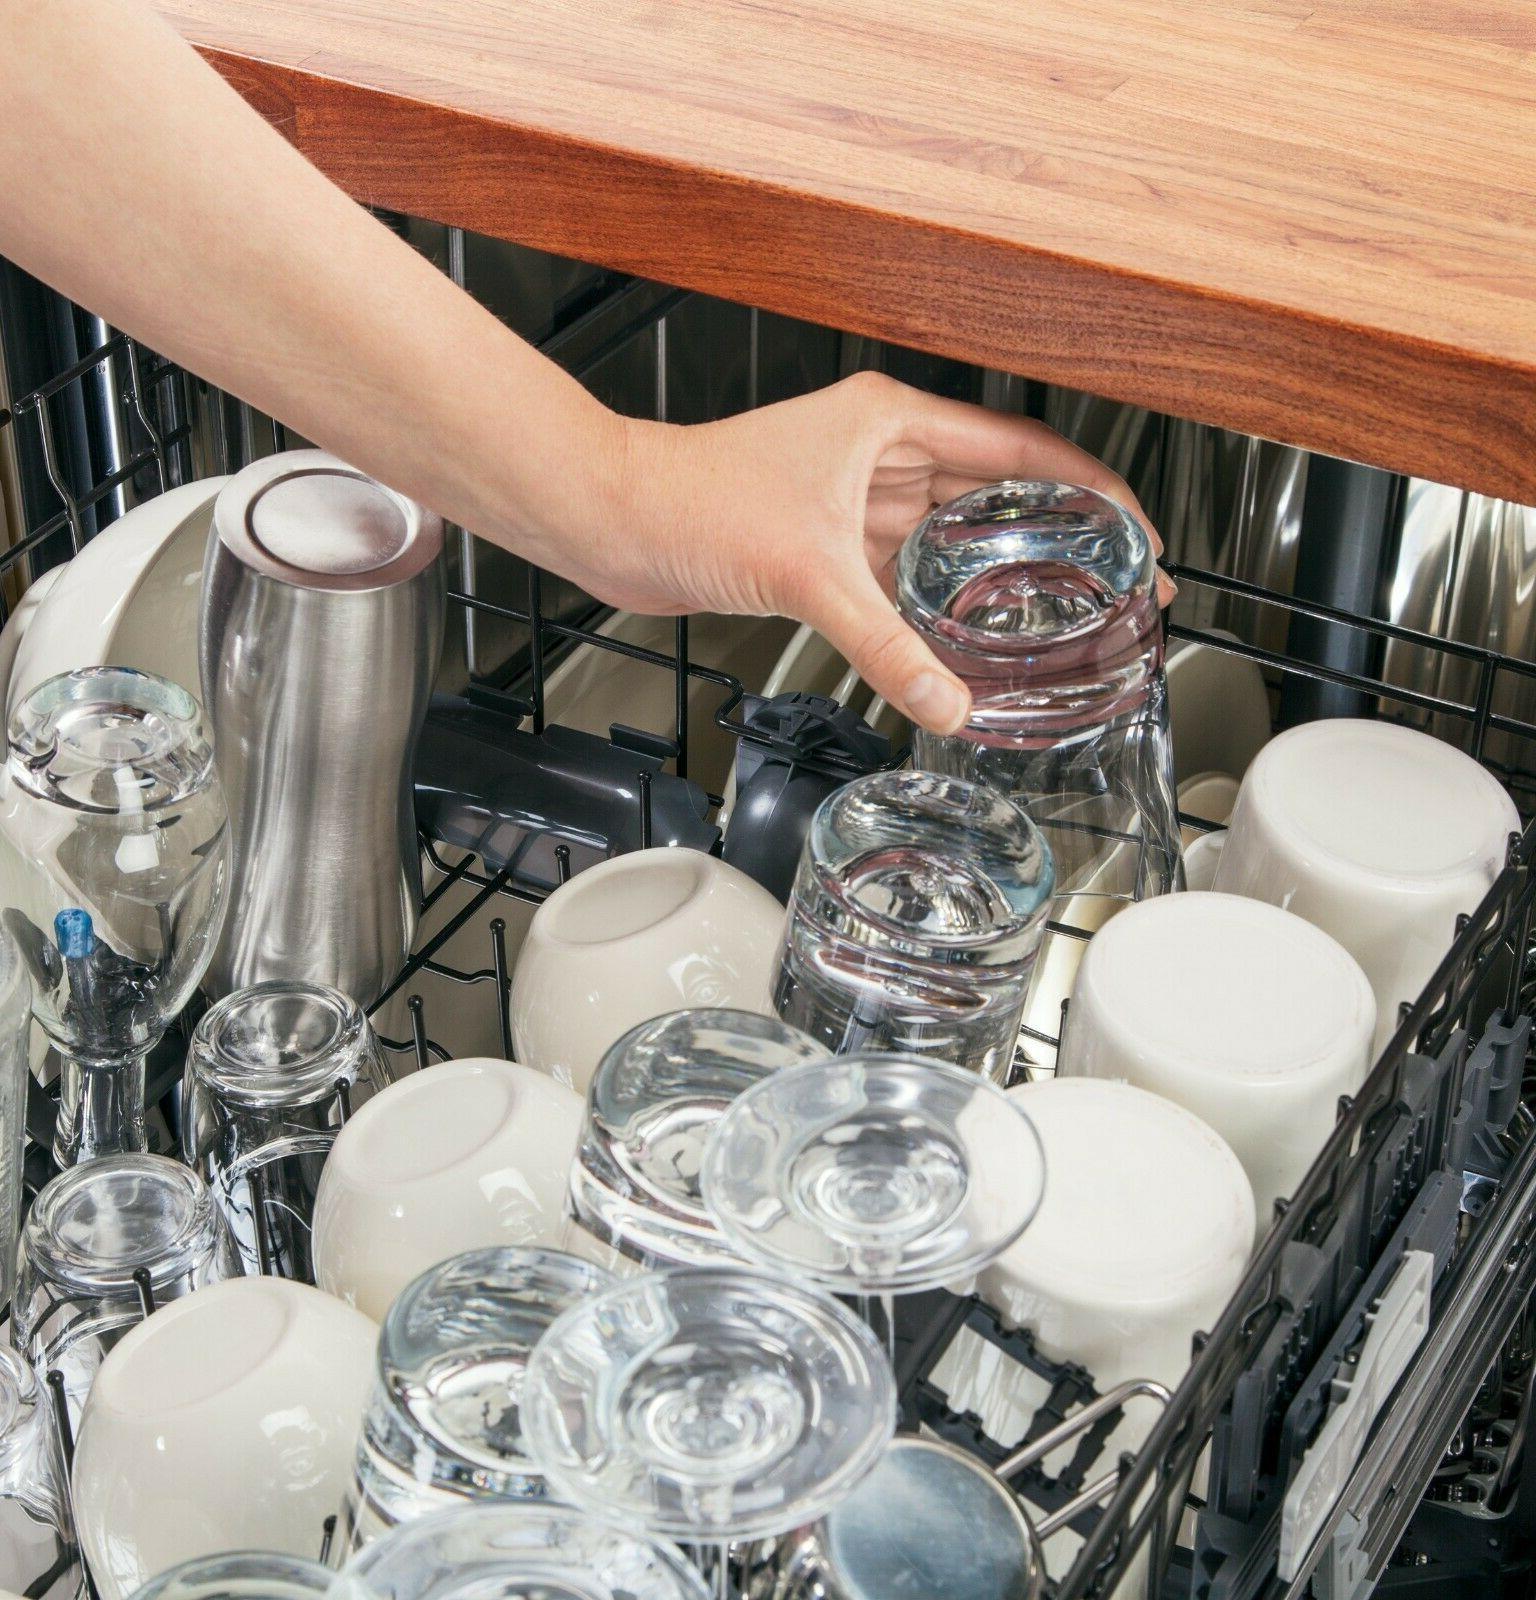 GE FULLY INTEGRATED DISHWASHER -